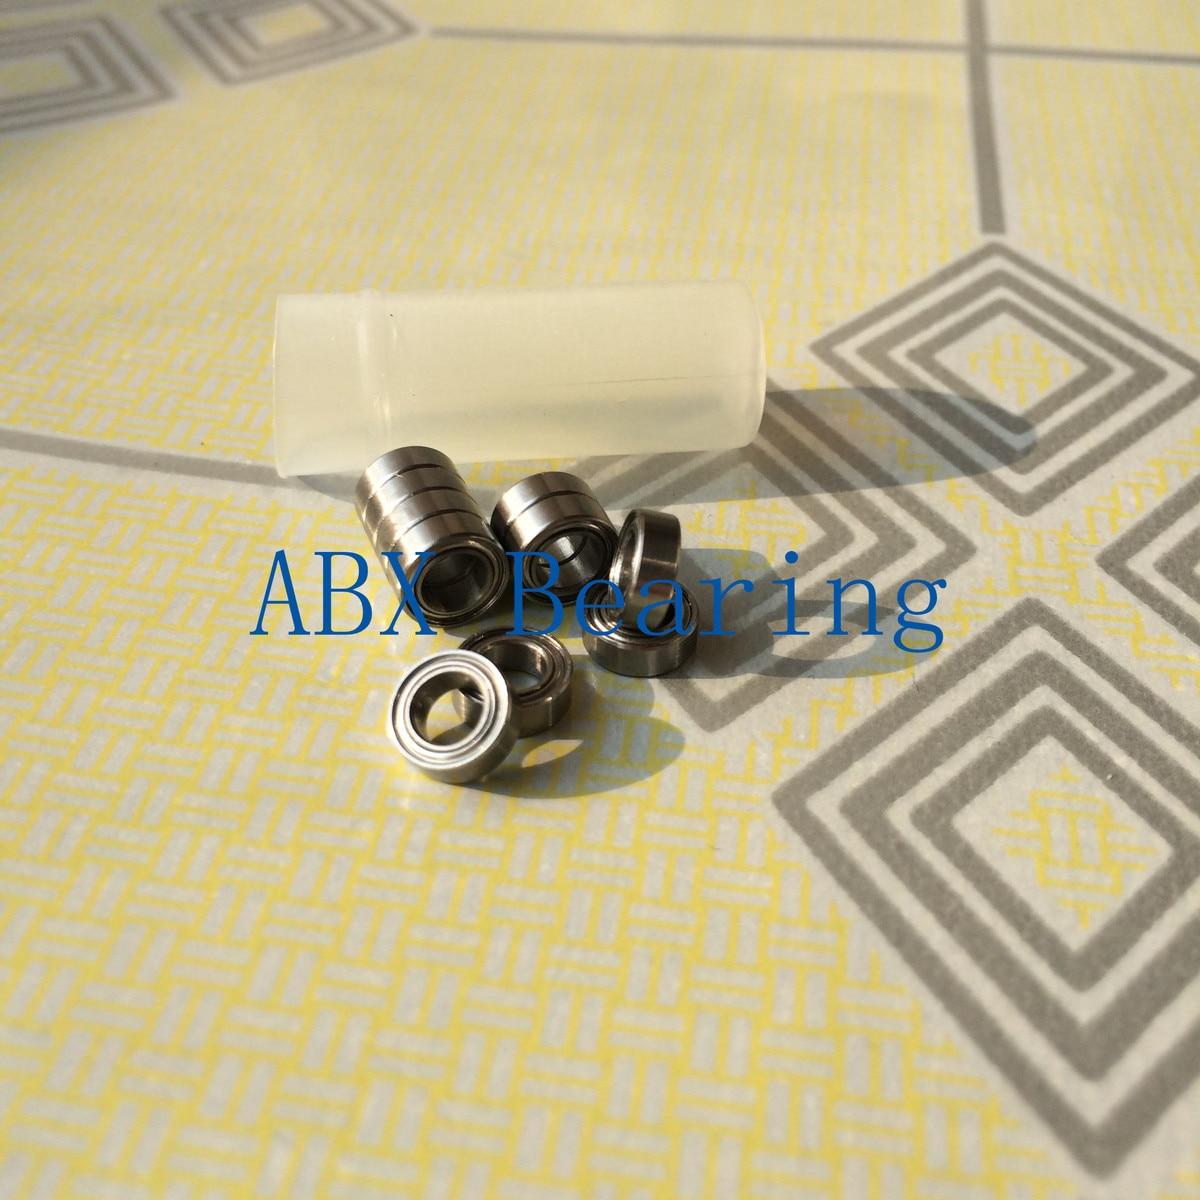 Free shipping 50pcs/lot MR63ZZ MR63Z MR63 L-630ZZ 673ZZ ball bearing 3x6x2.5 mm miniature bearing 3*6*2.5 mm mini bearing free shipping 10pcs mr62zz mr63zz mr74zz mr84zz mr104zz mr85zz mr95zz mr105zz mr115zz mr83zz miniature bearing